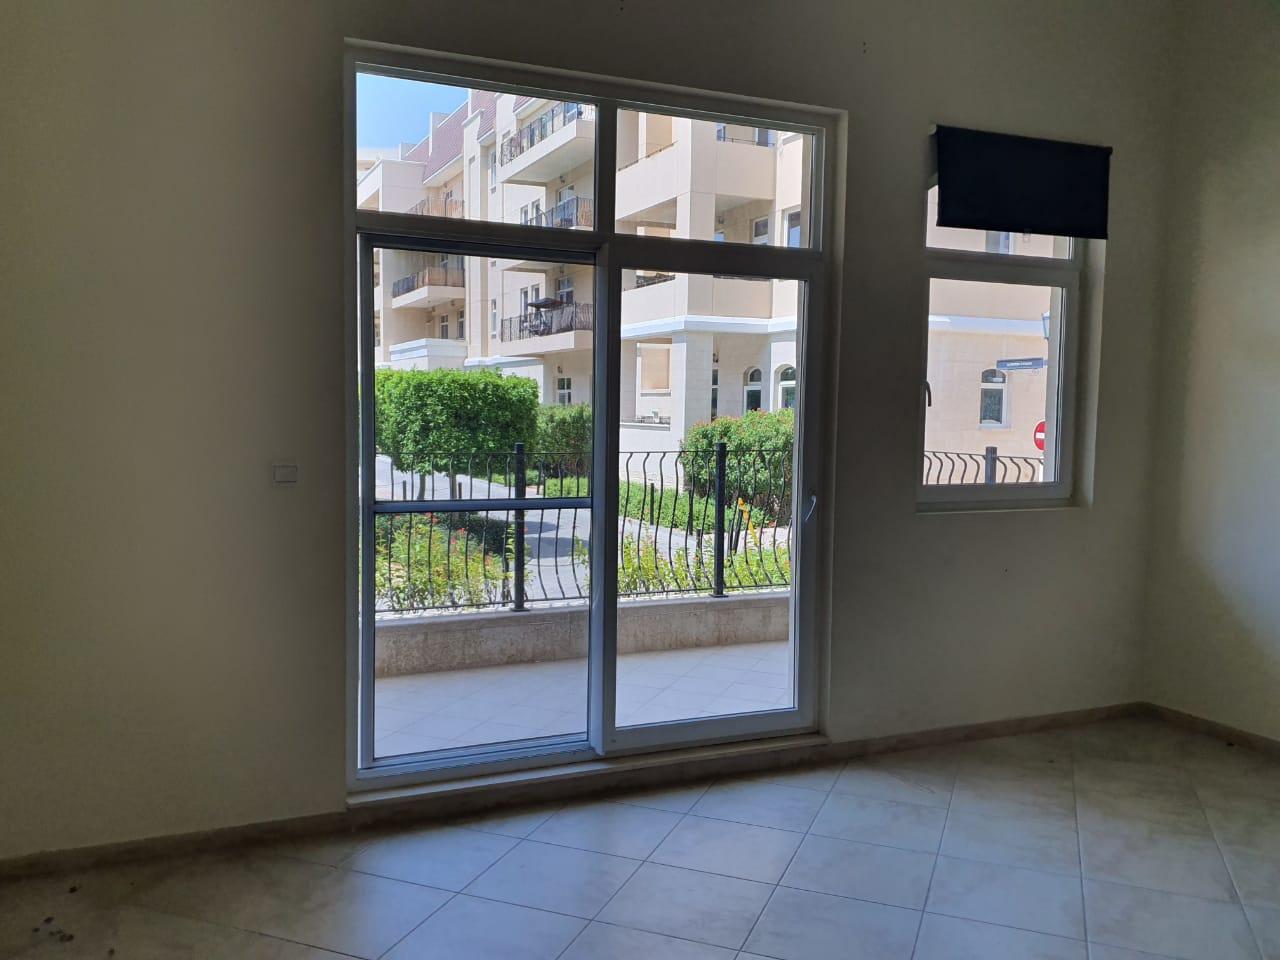 Hot Deal! Spacious Studio with Big Balcony